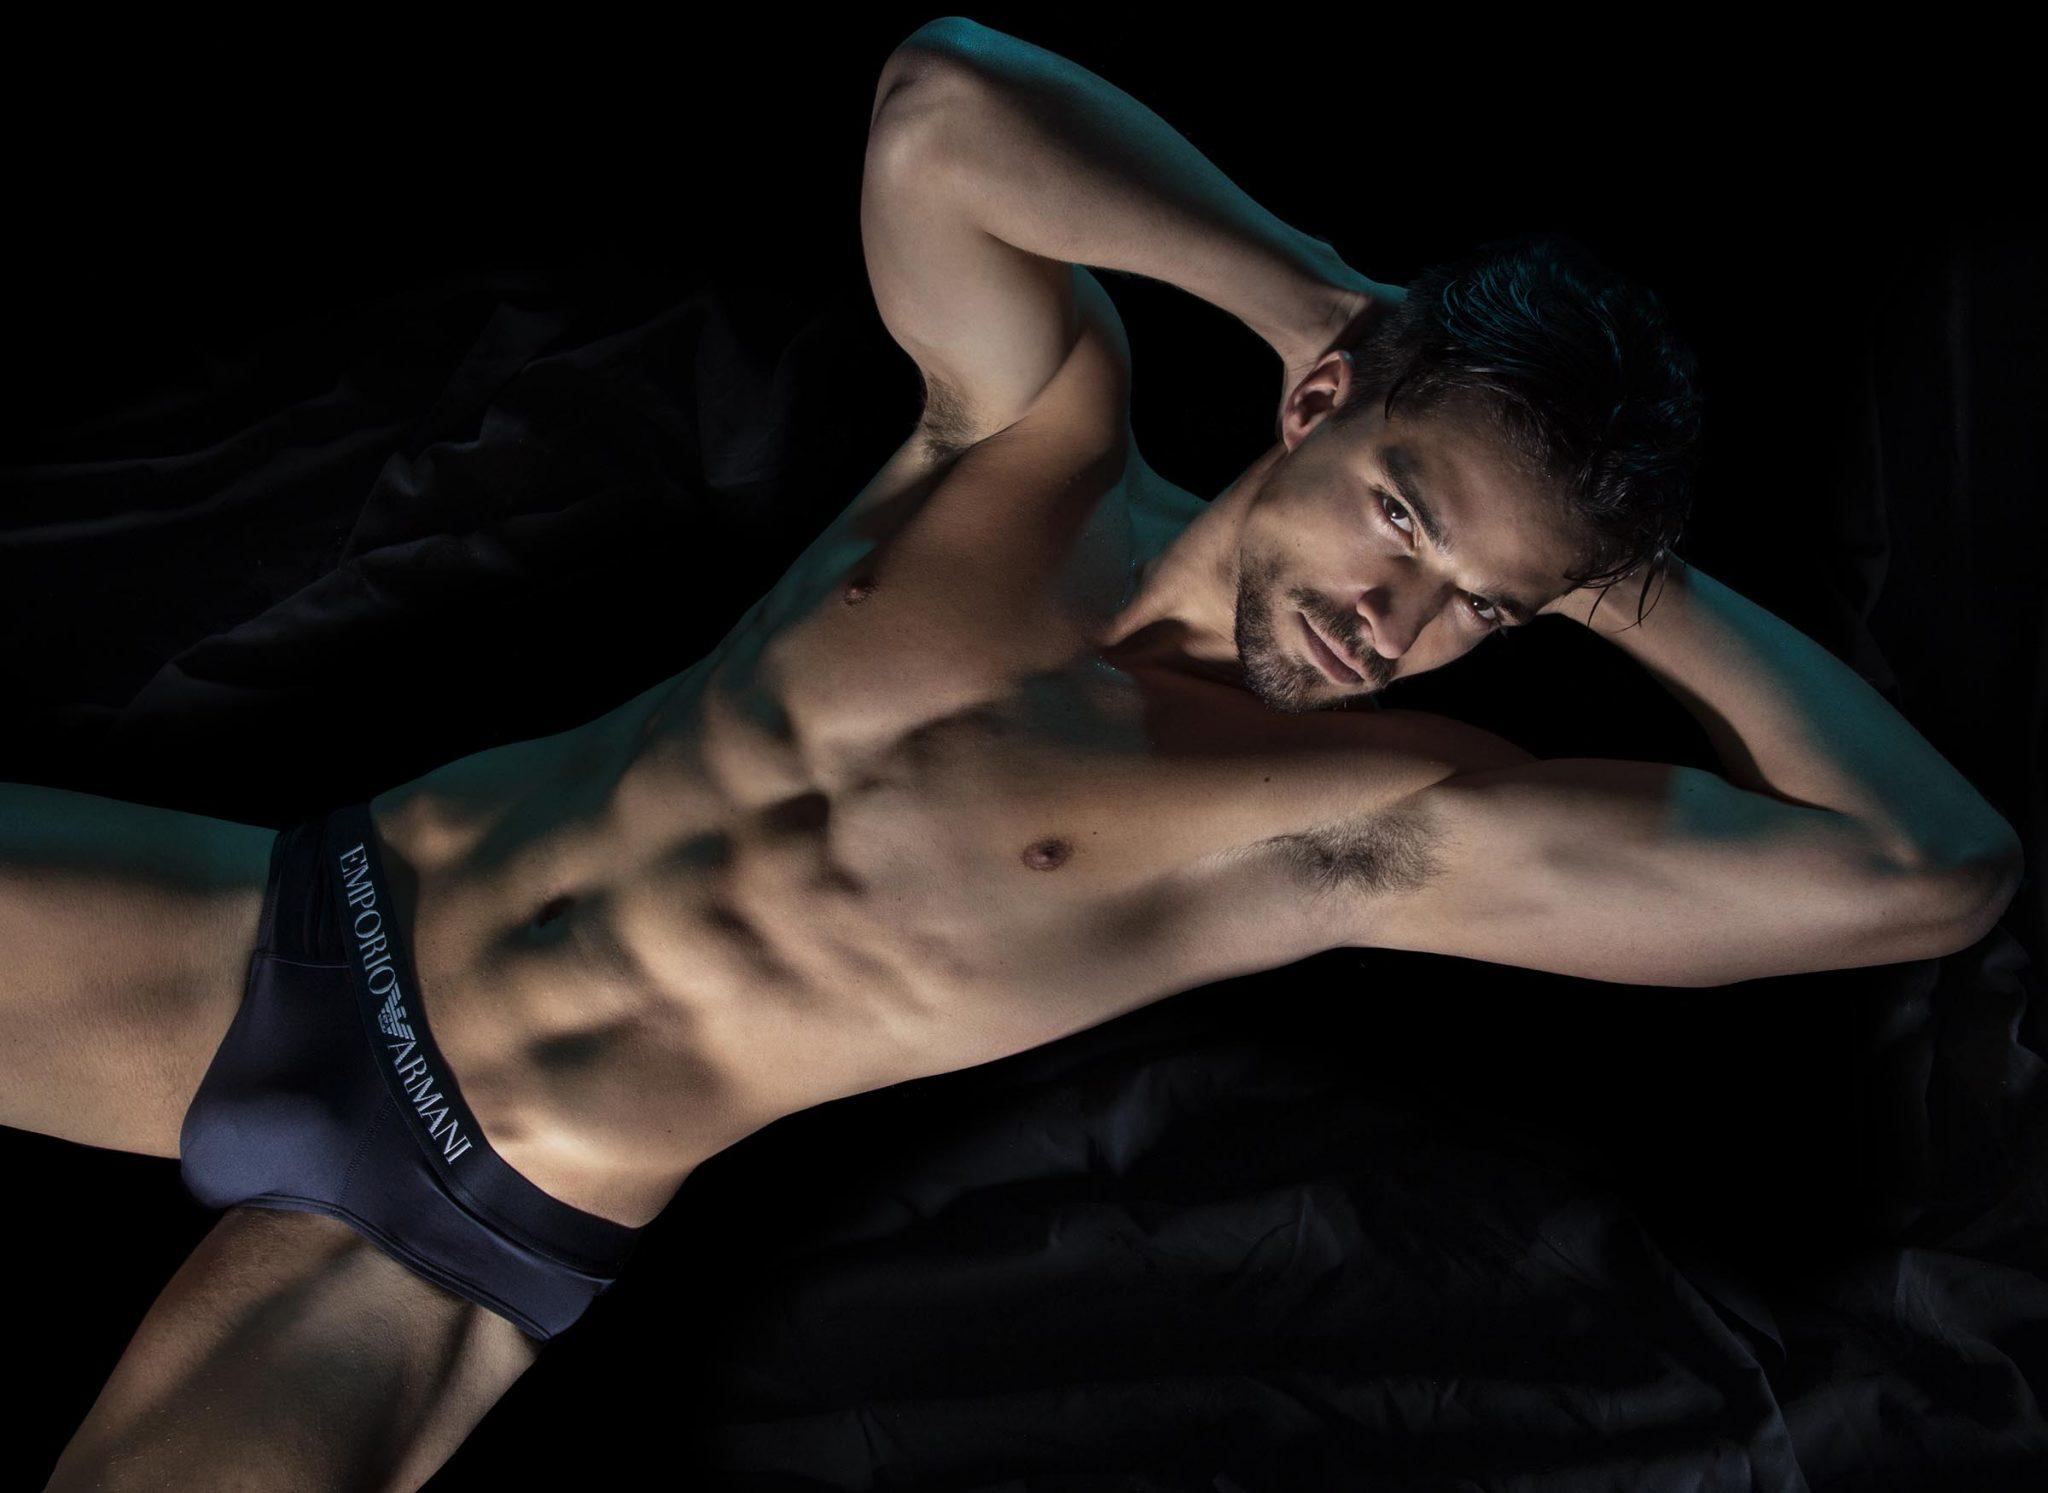 Jean Mariz by Giulio Cunico for Brazilian Male Model